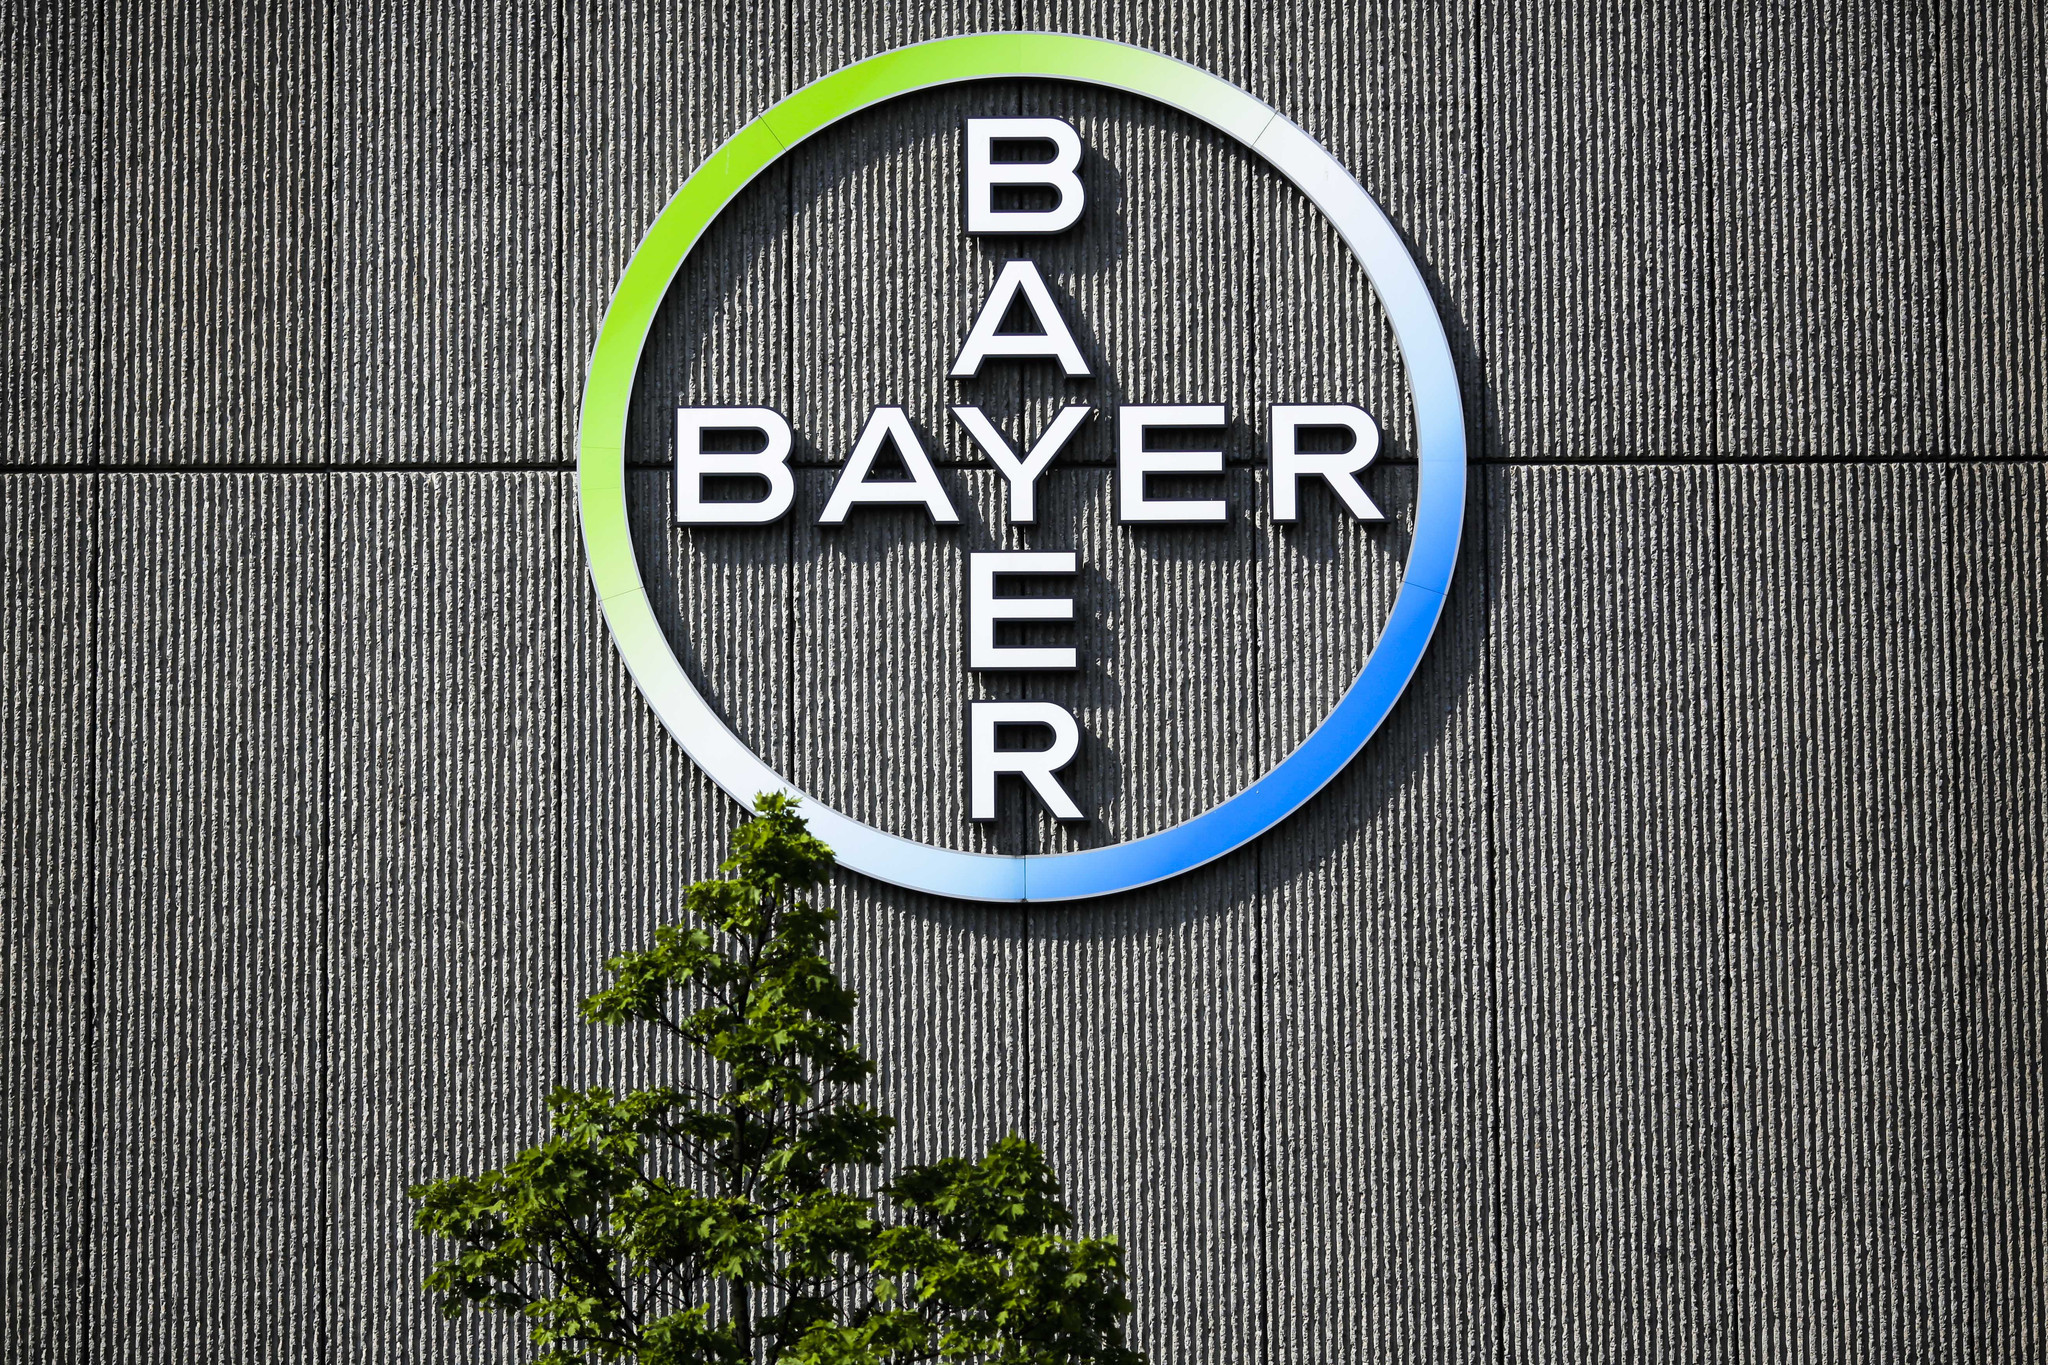 http://w-n.com.ua/wp-content/uploads/2016/09/Bayer-покупает-Monsanto.jpg